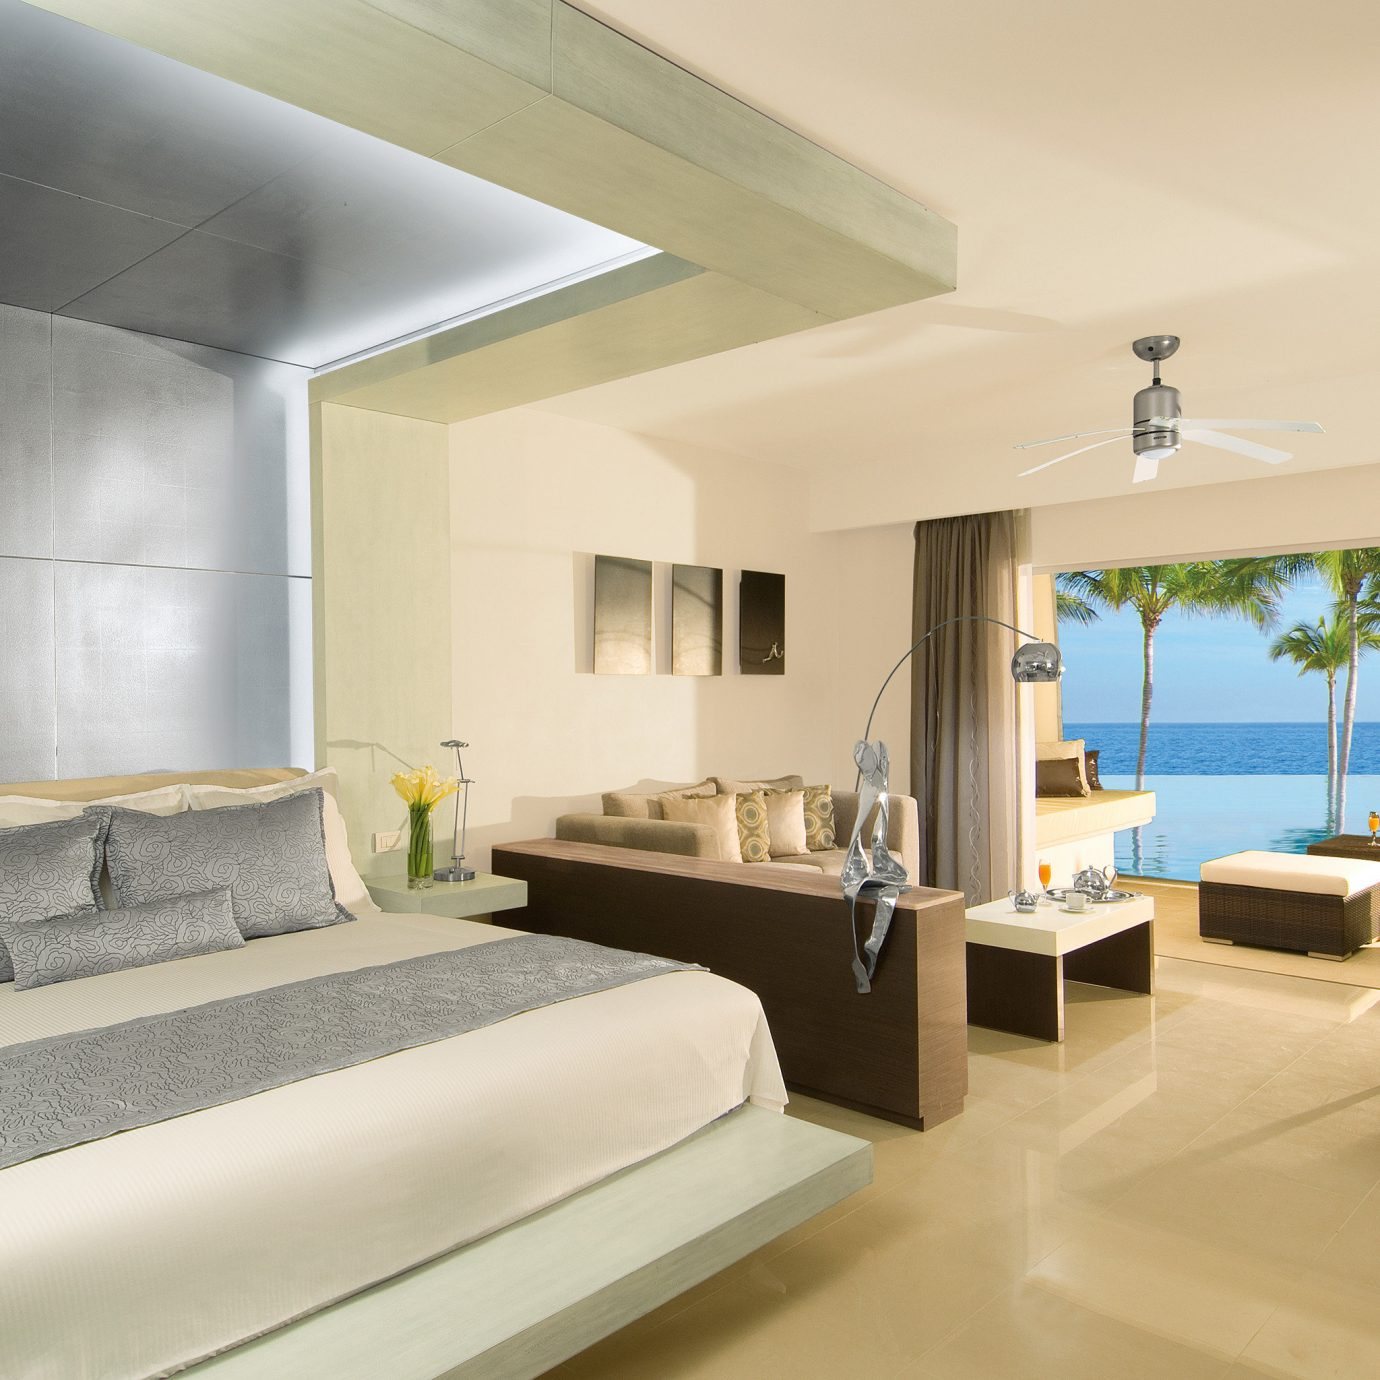 Balcony Beachfront Bedroom Elegant Hip Luxury Modern Scenic views Suite property condominium Villa living room clean